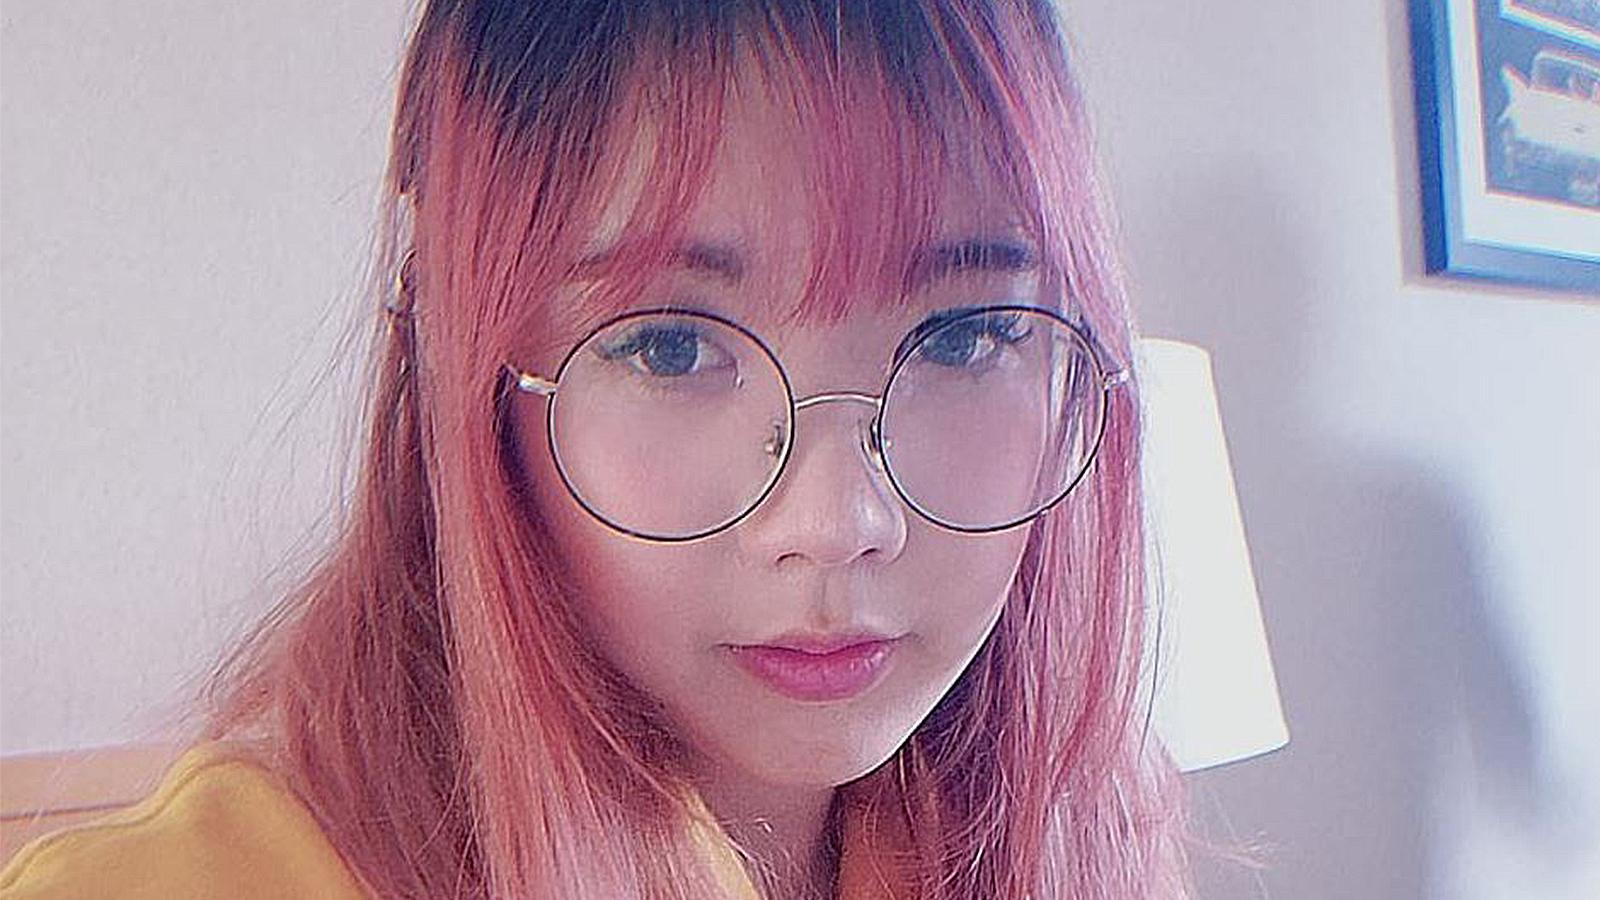 Lilypichu glasses